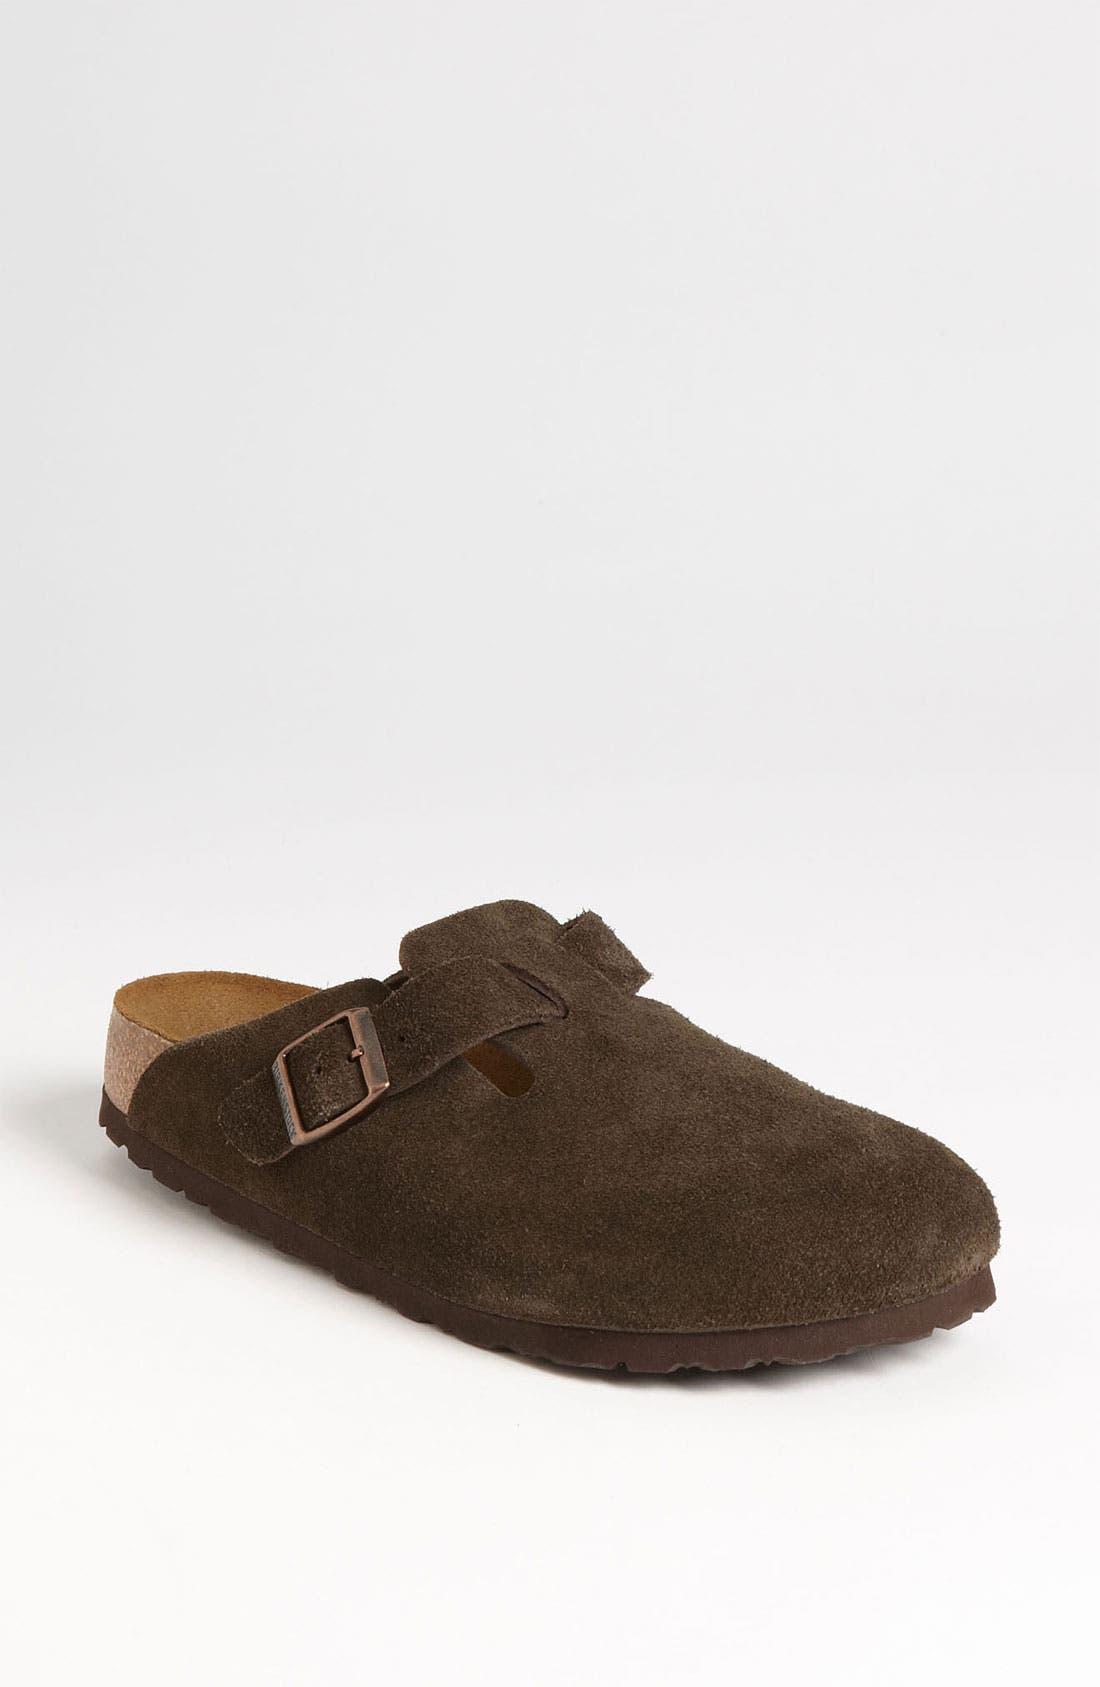 Birkenstock 'Boston' Soft Footbed Clog (Women)